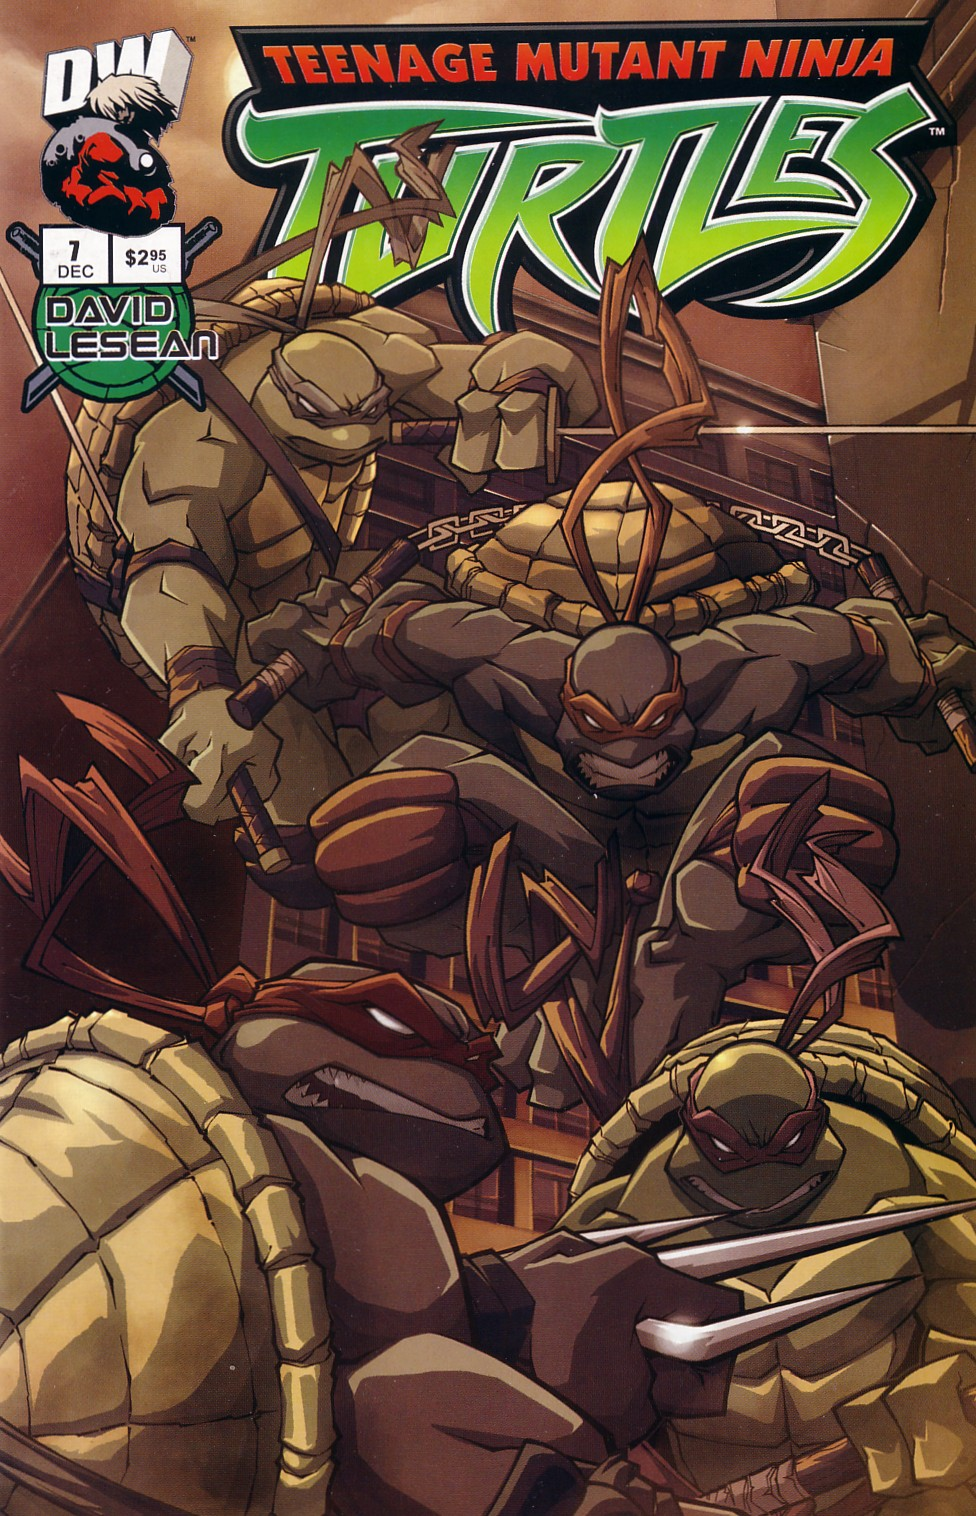 Teenage Mutant Ninja Turtles (2003) chap 7 pic 1